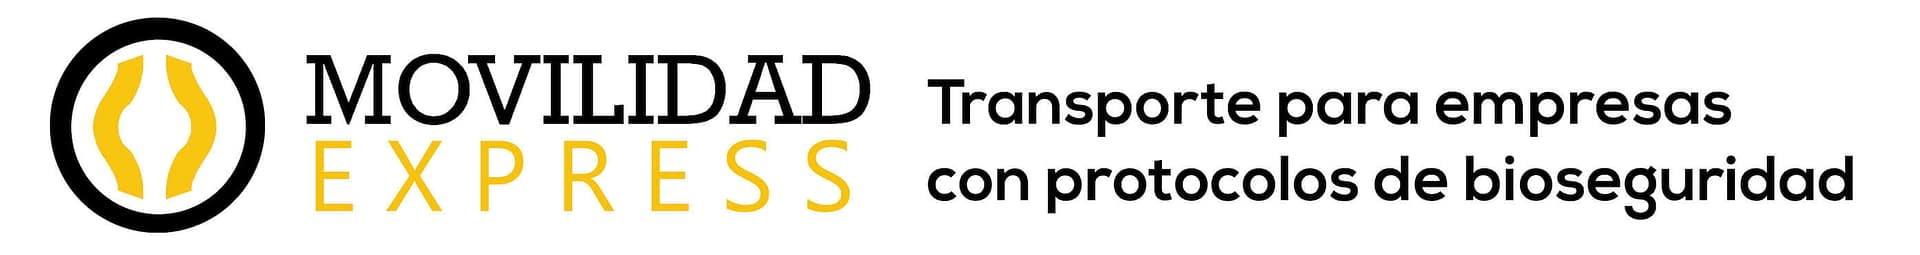 Movilidad-express-logo-official